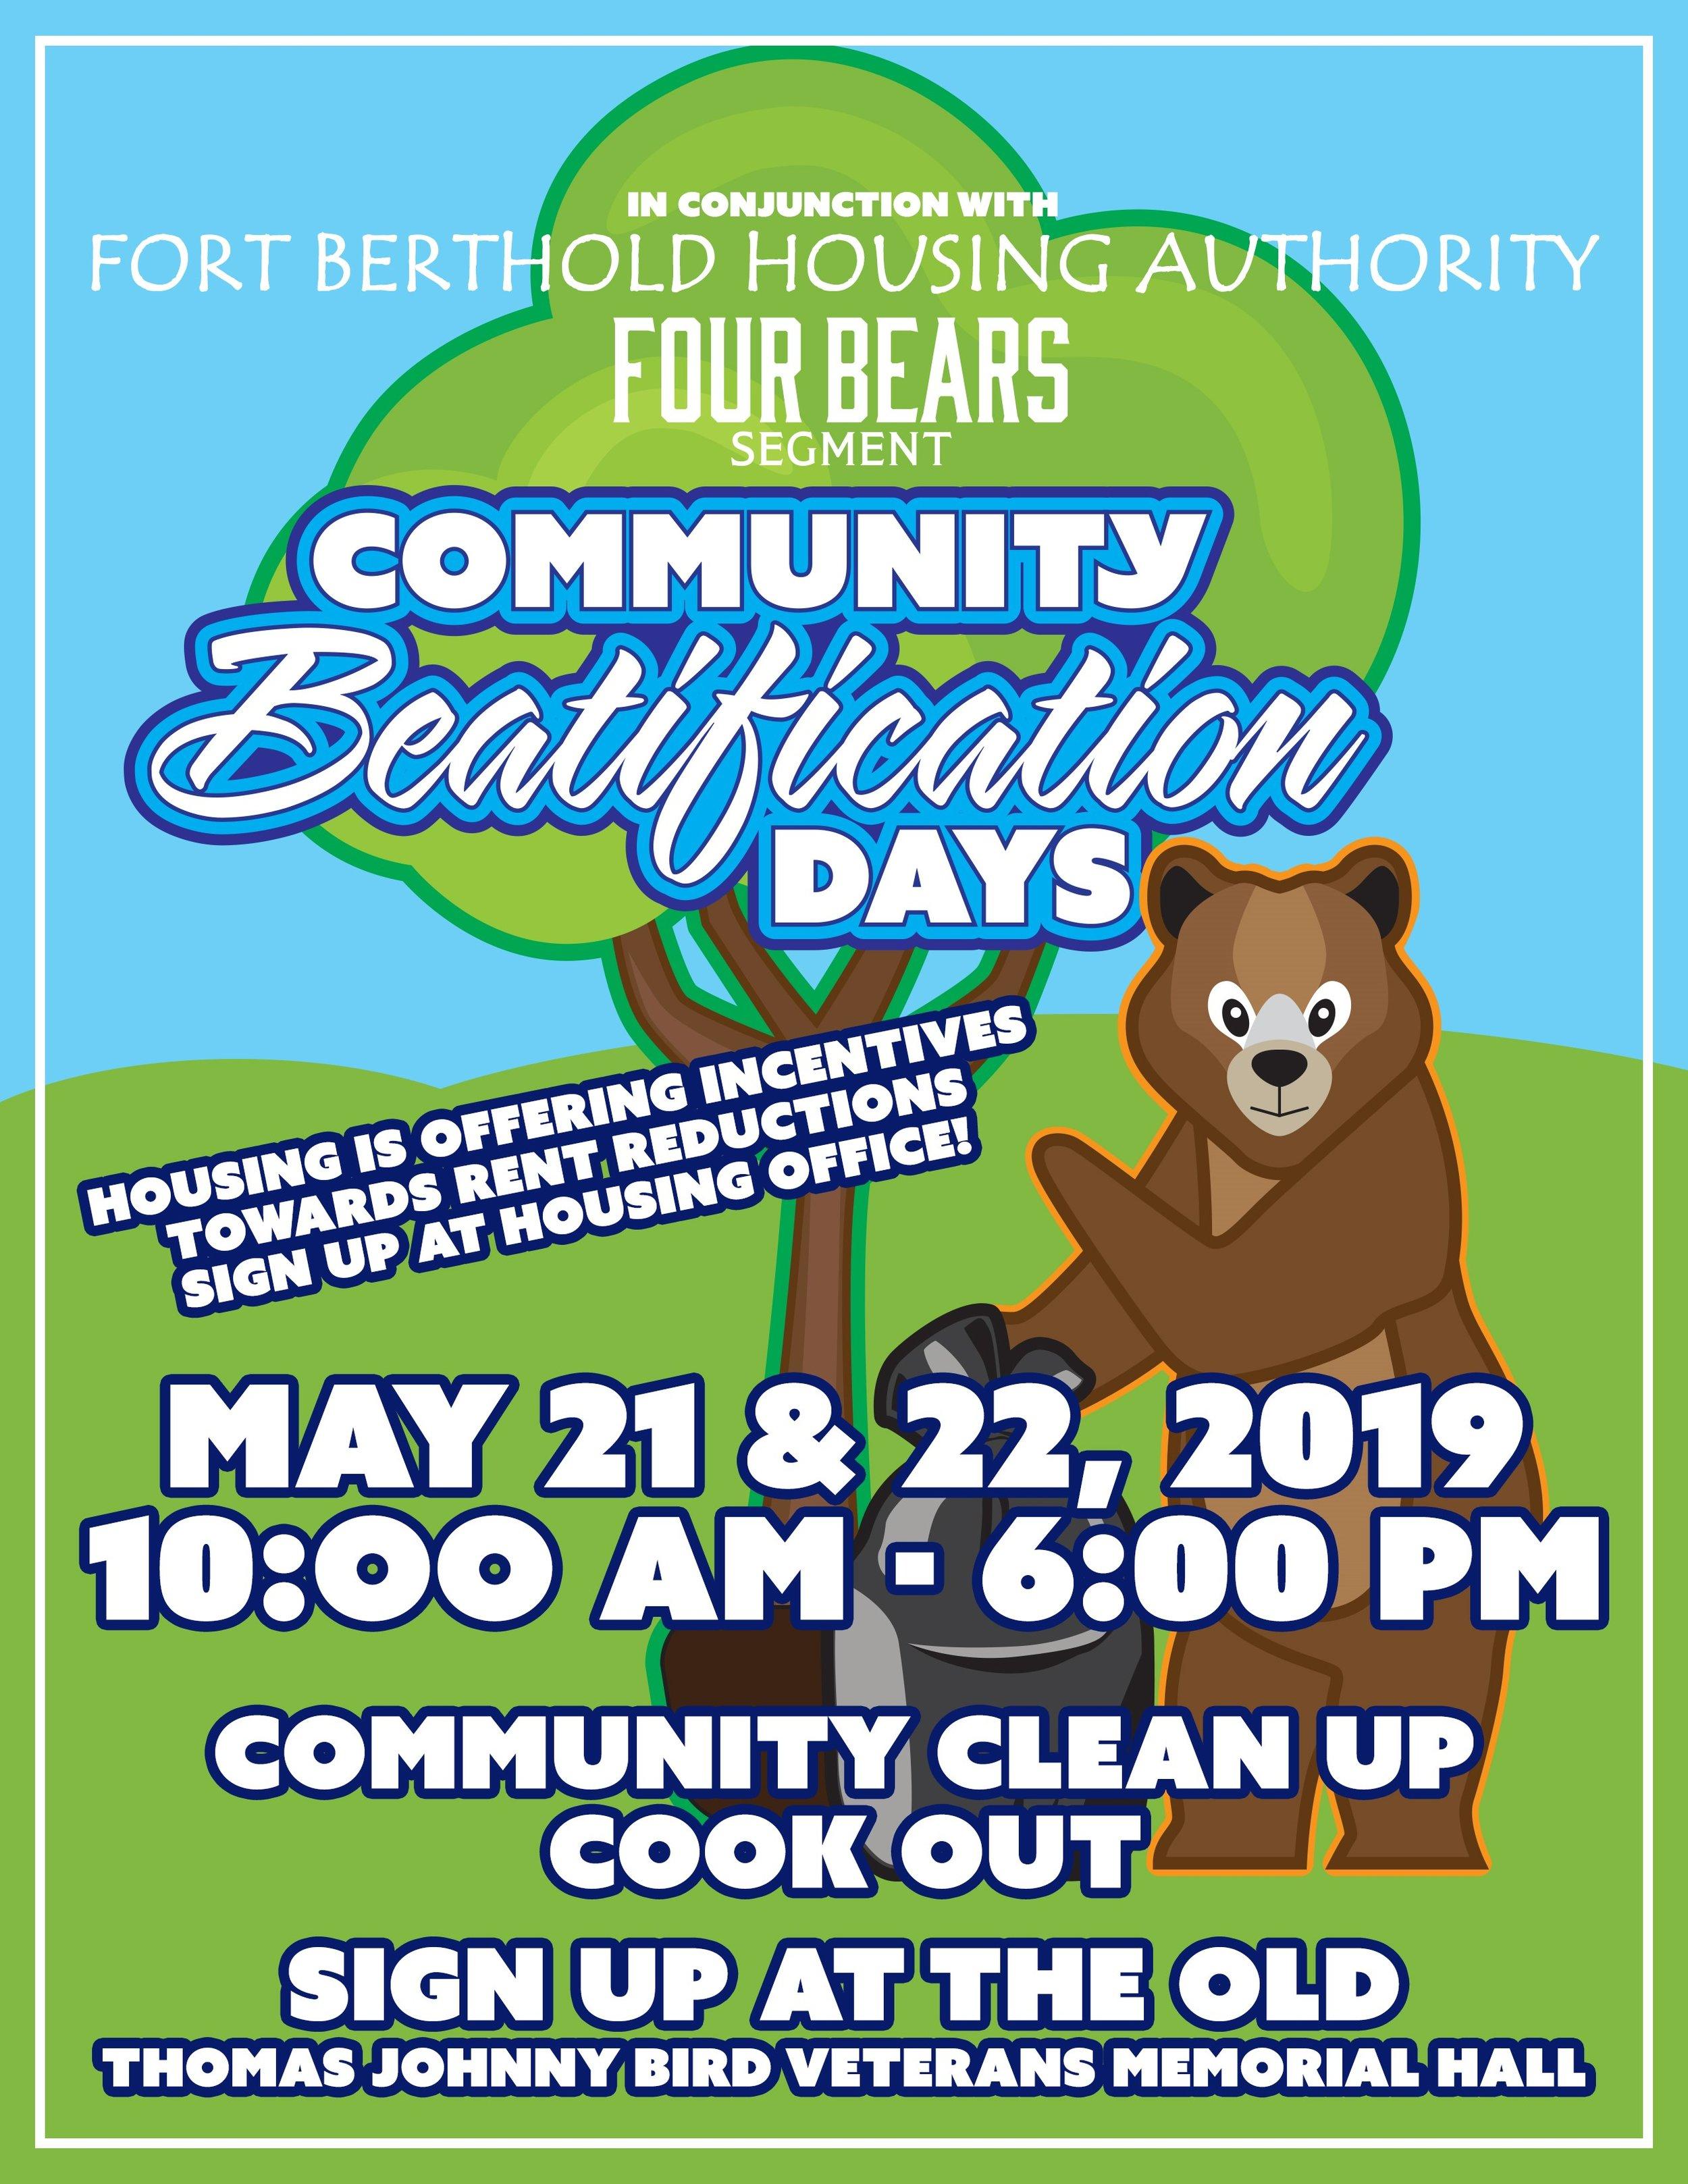 Four Bears Community Beautification Days.jpg